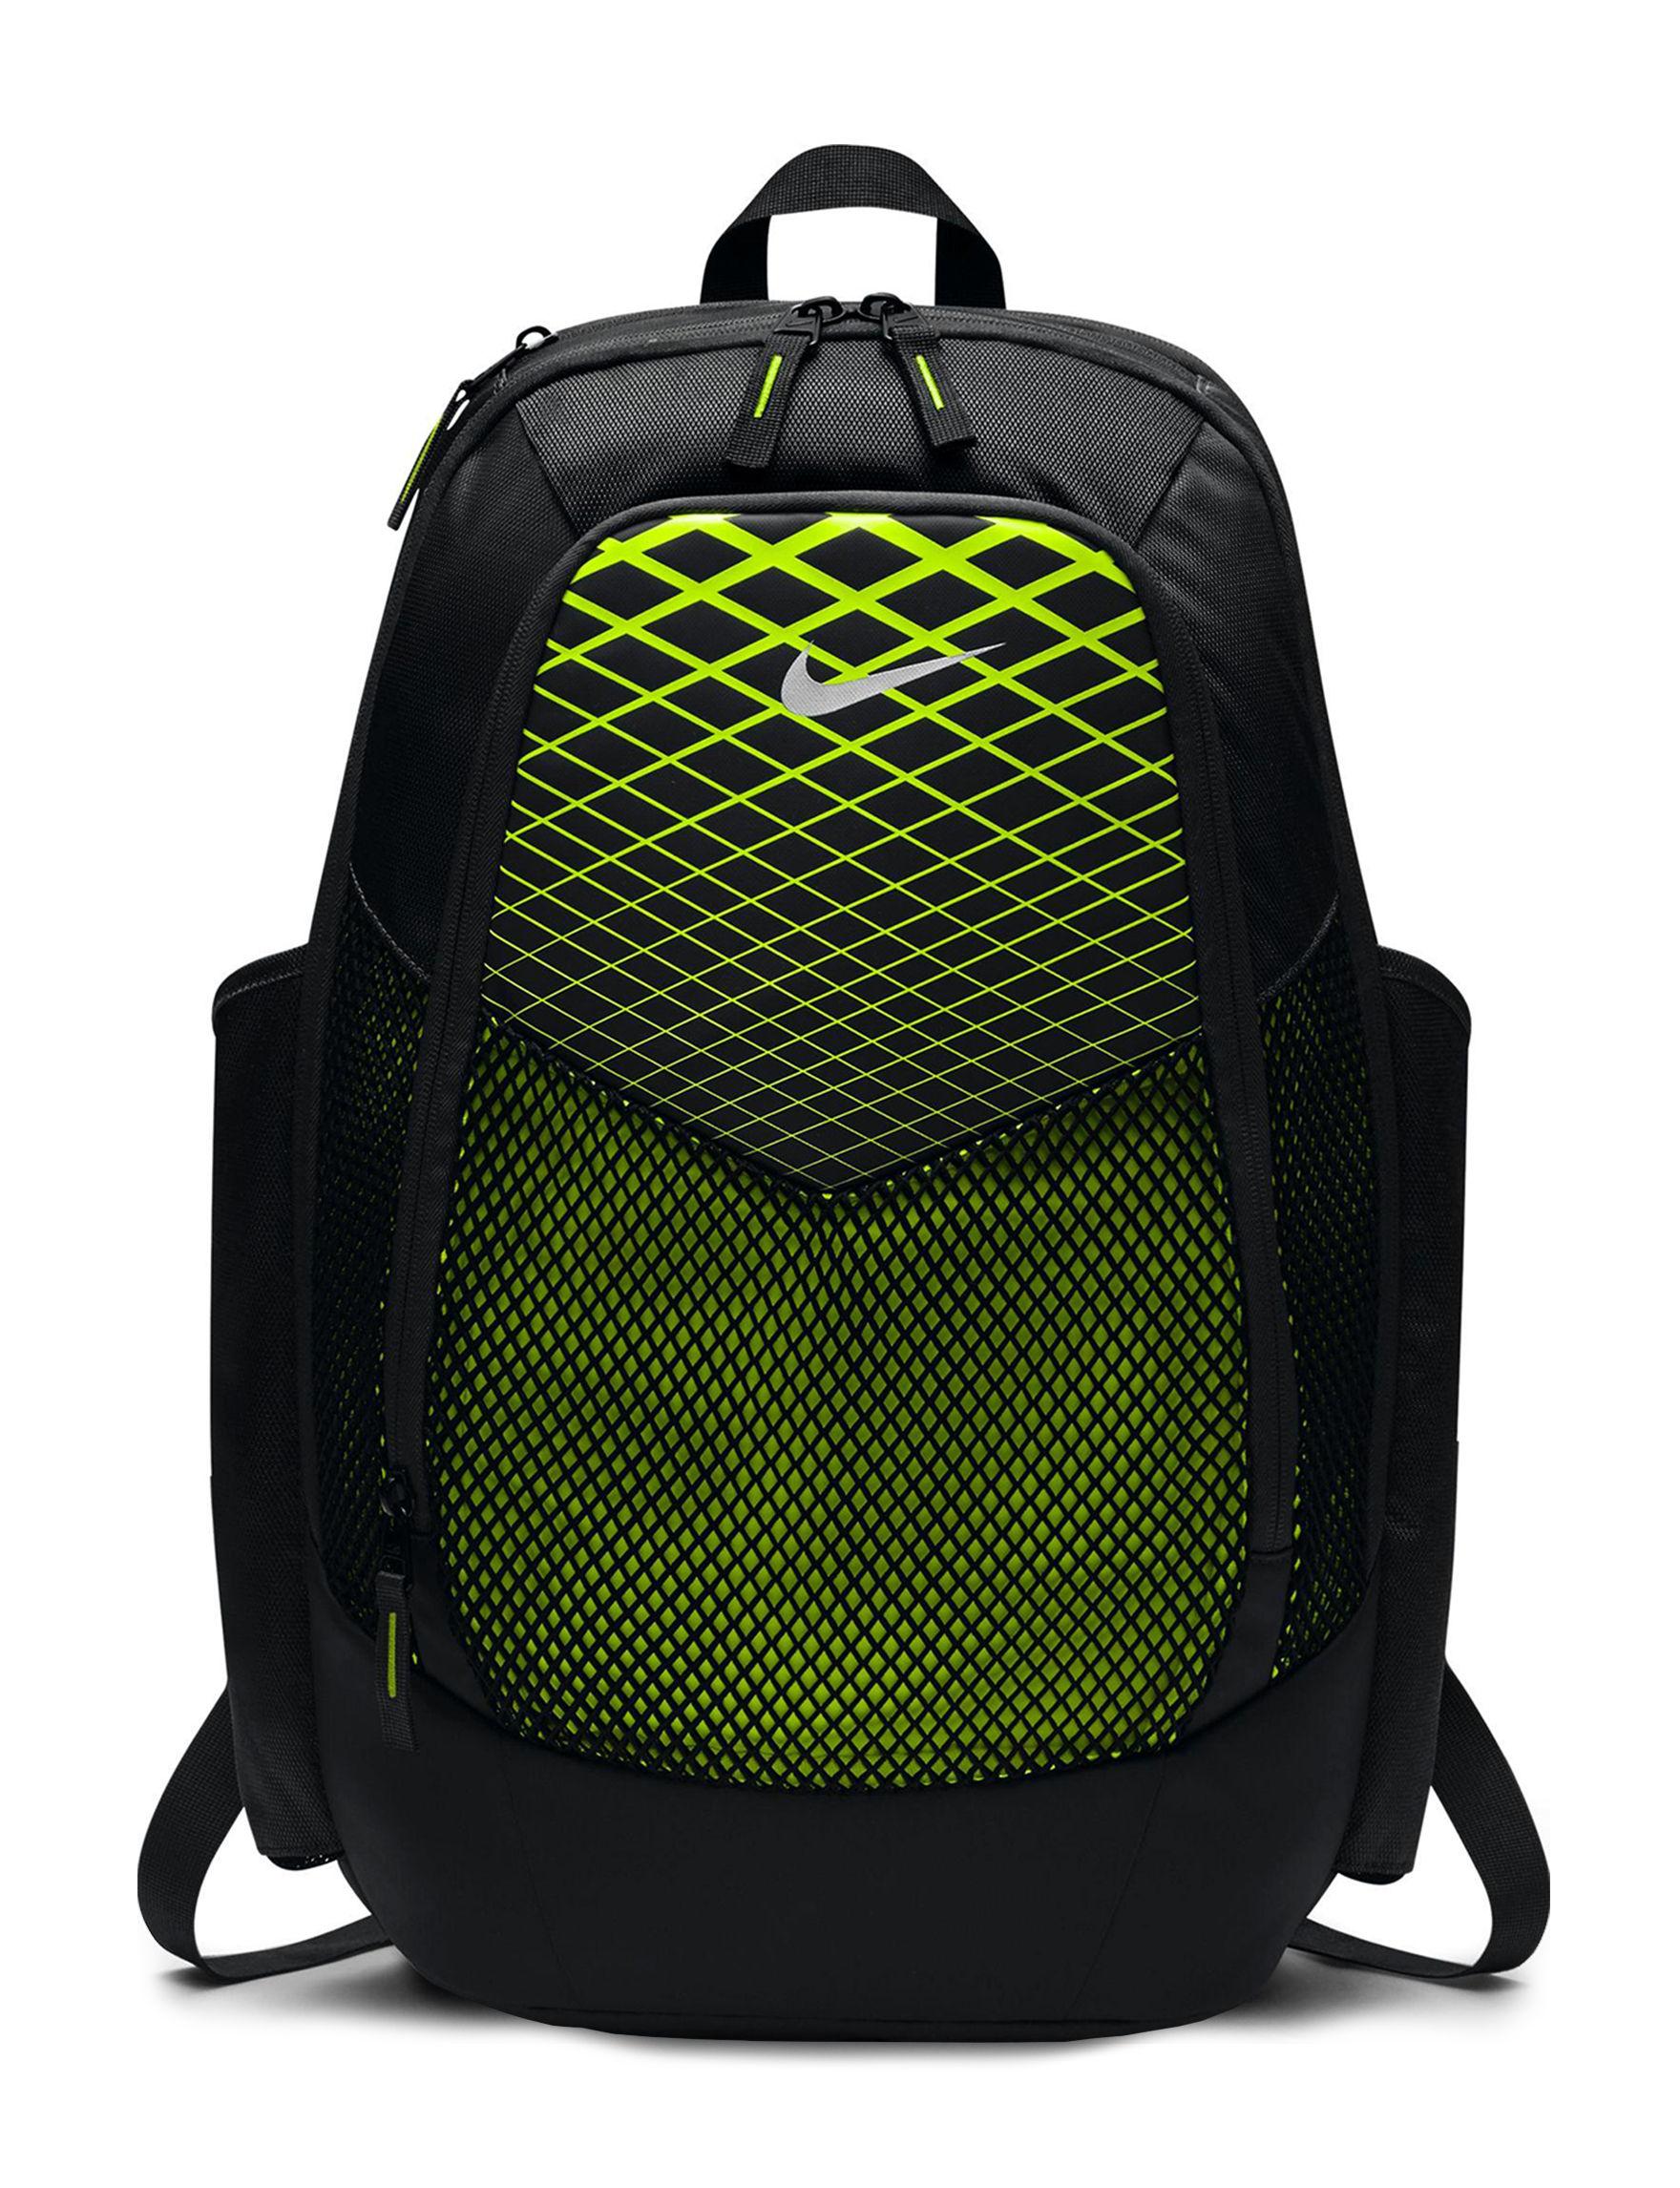 Nike Black / Lime Bookbags & Backpacks